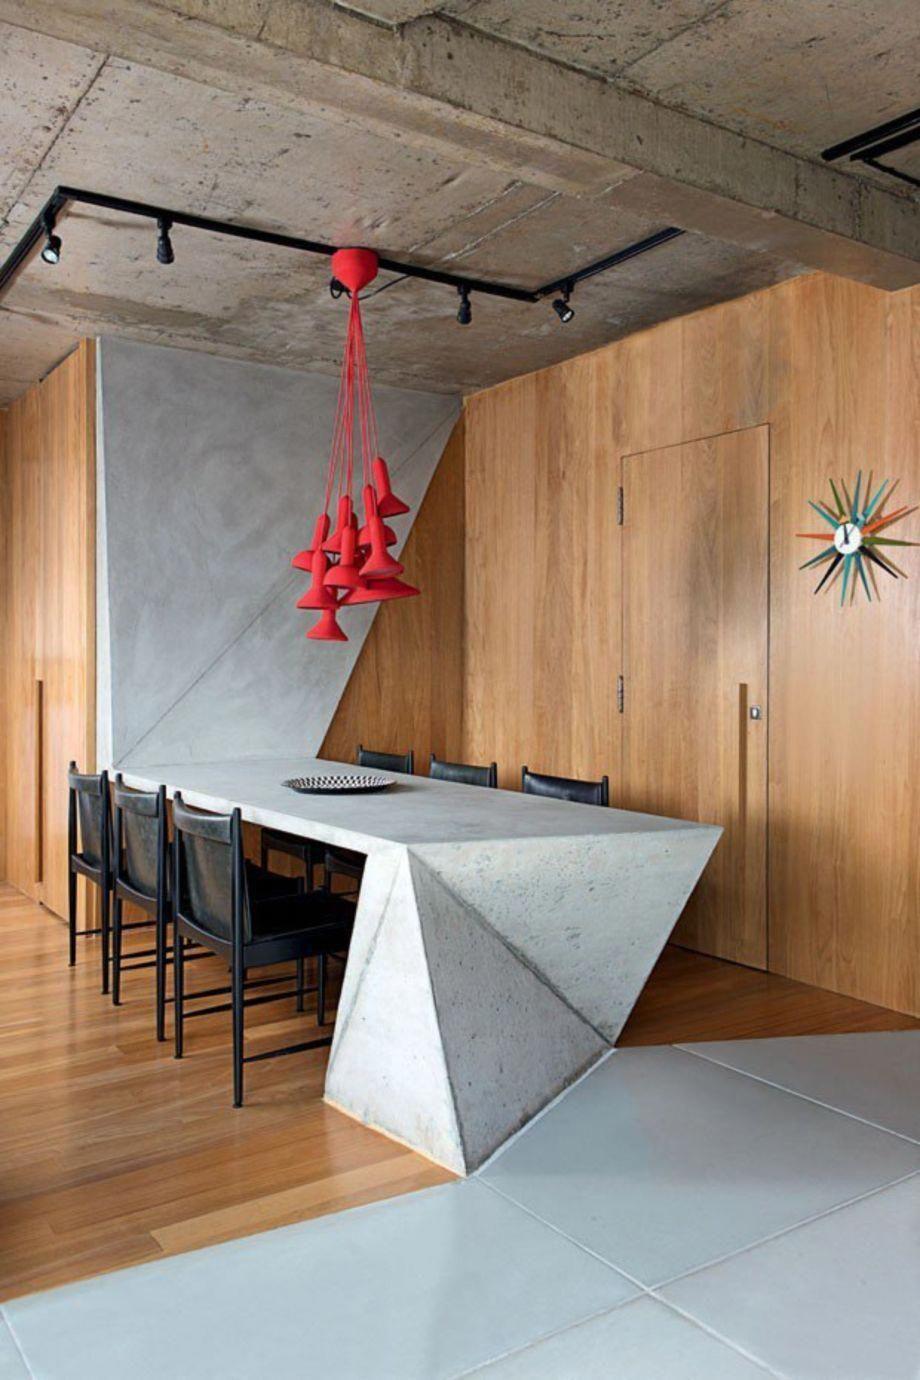 Low Cost Furniture Shipping Furnitureexpooxnard Minimalist Dining Room Interior Architecture Design House Design